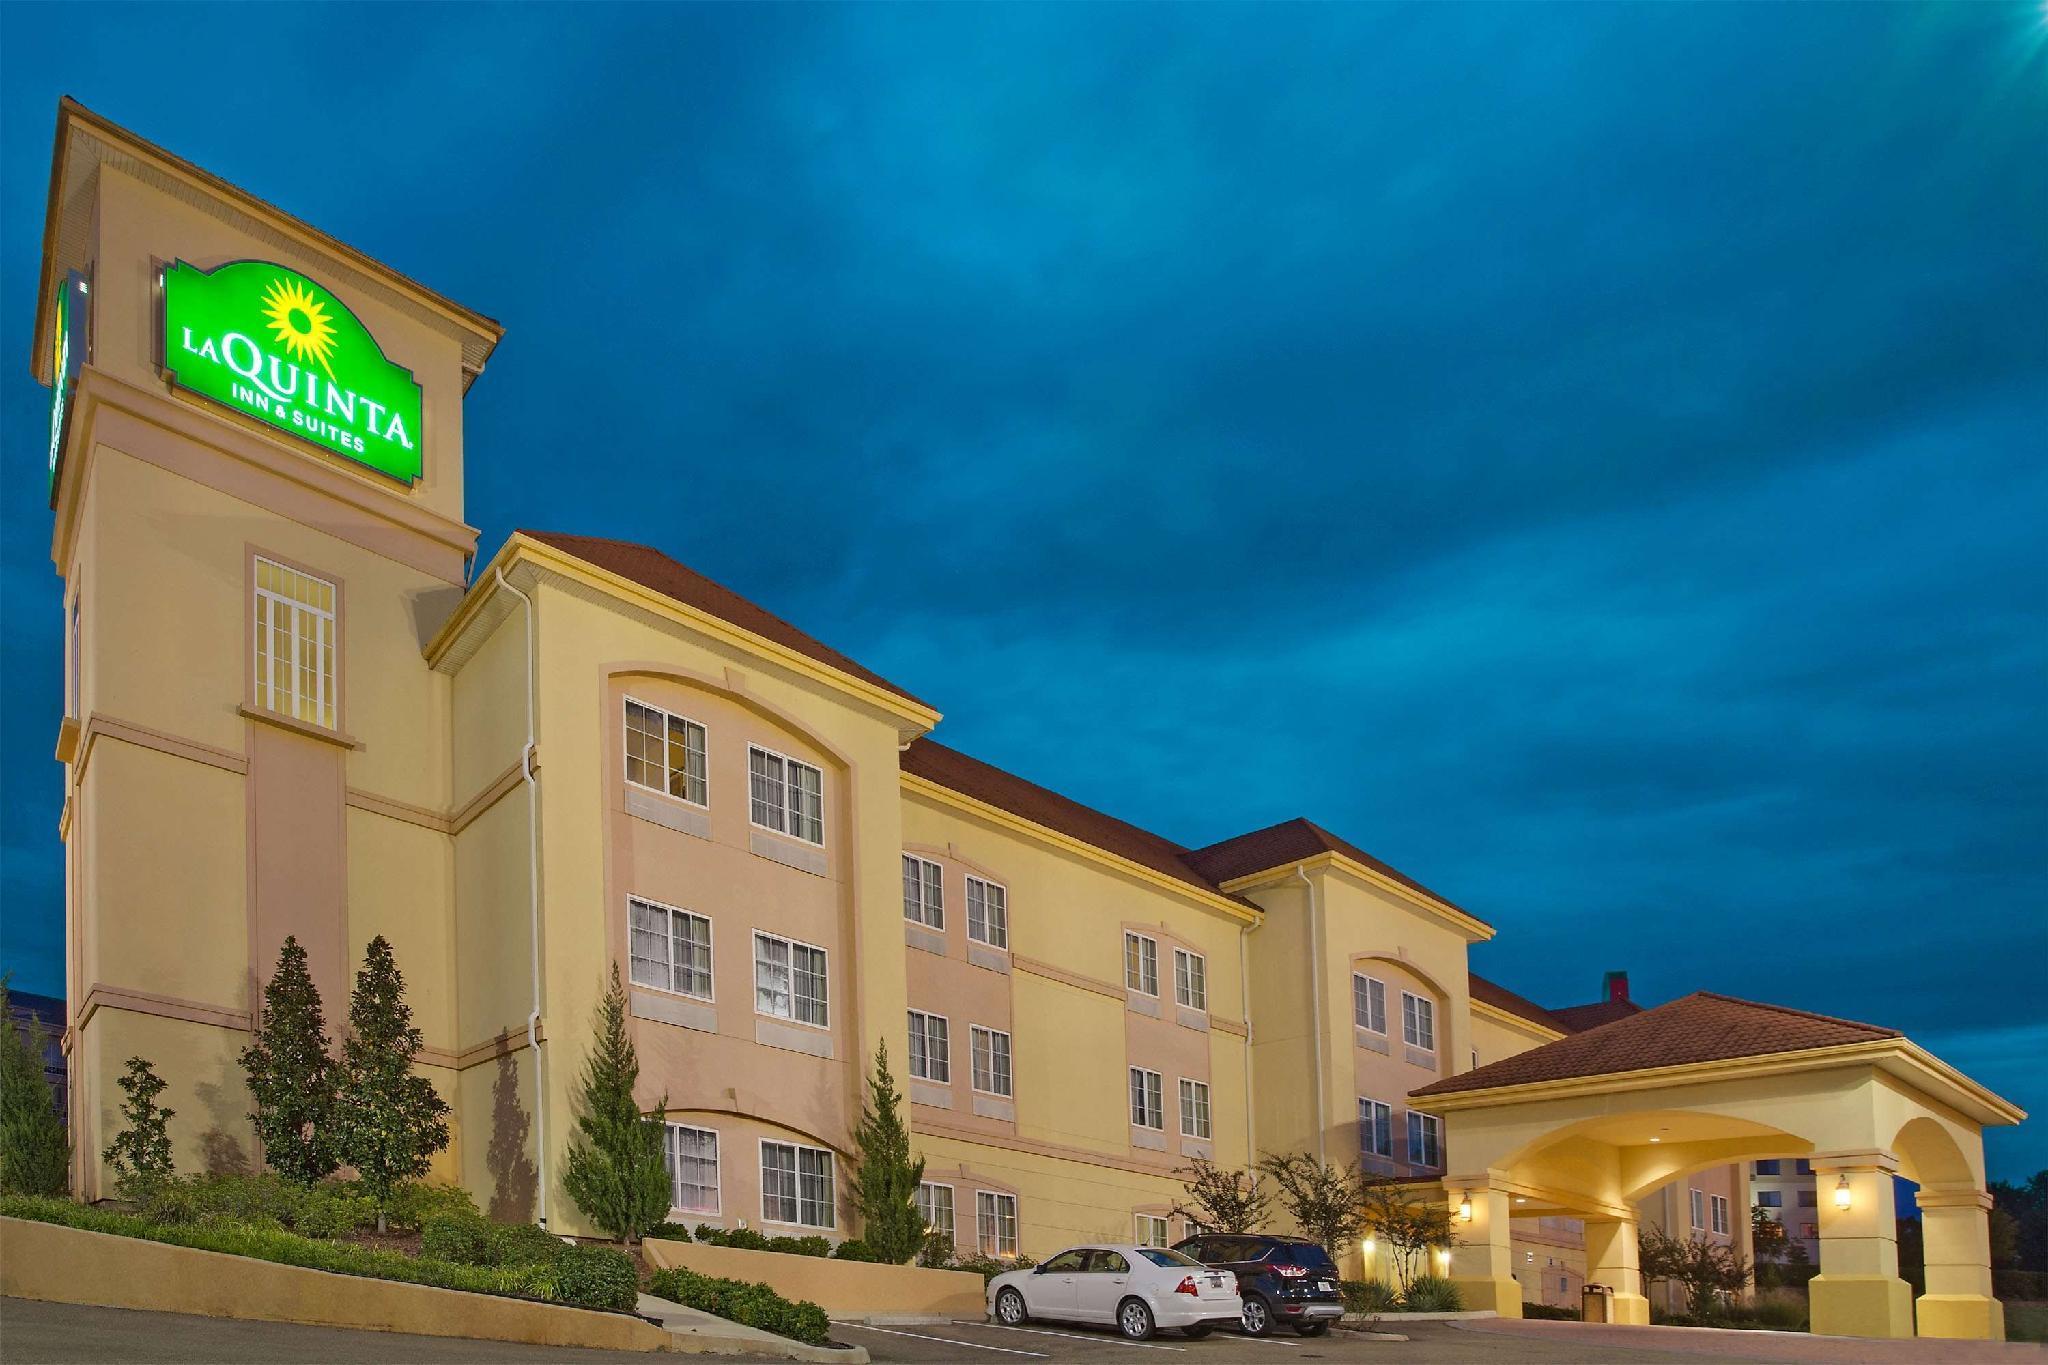 La Quinta Inn And Suites By Wyndham Vicksburg